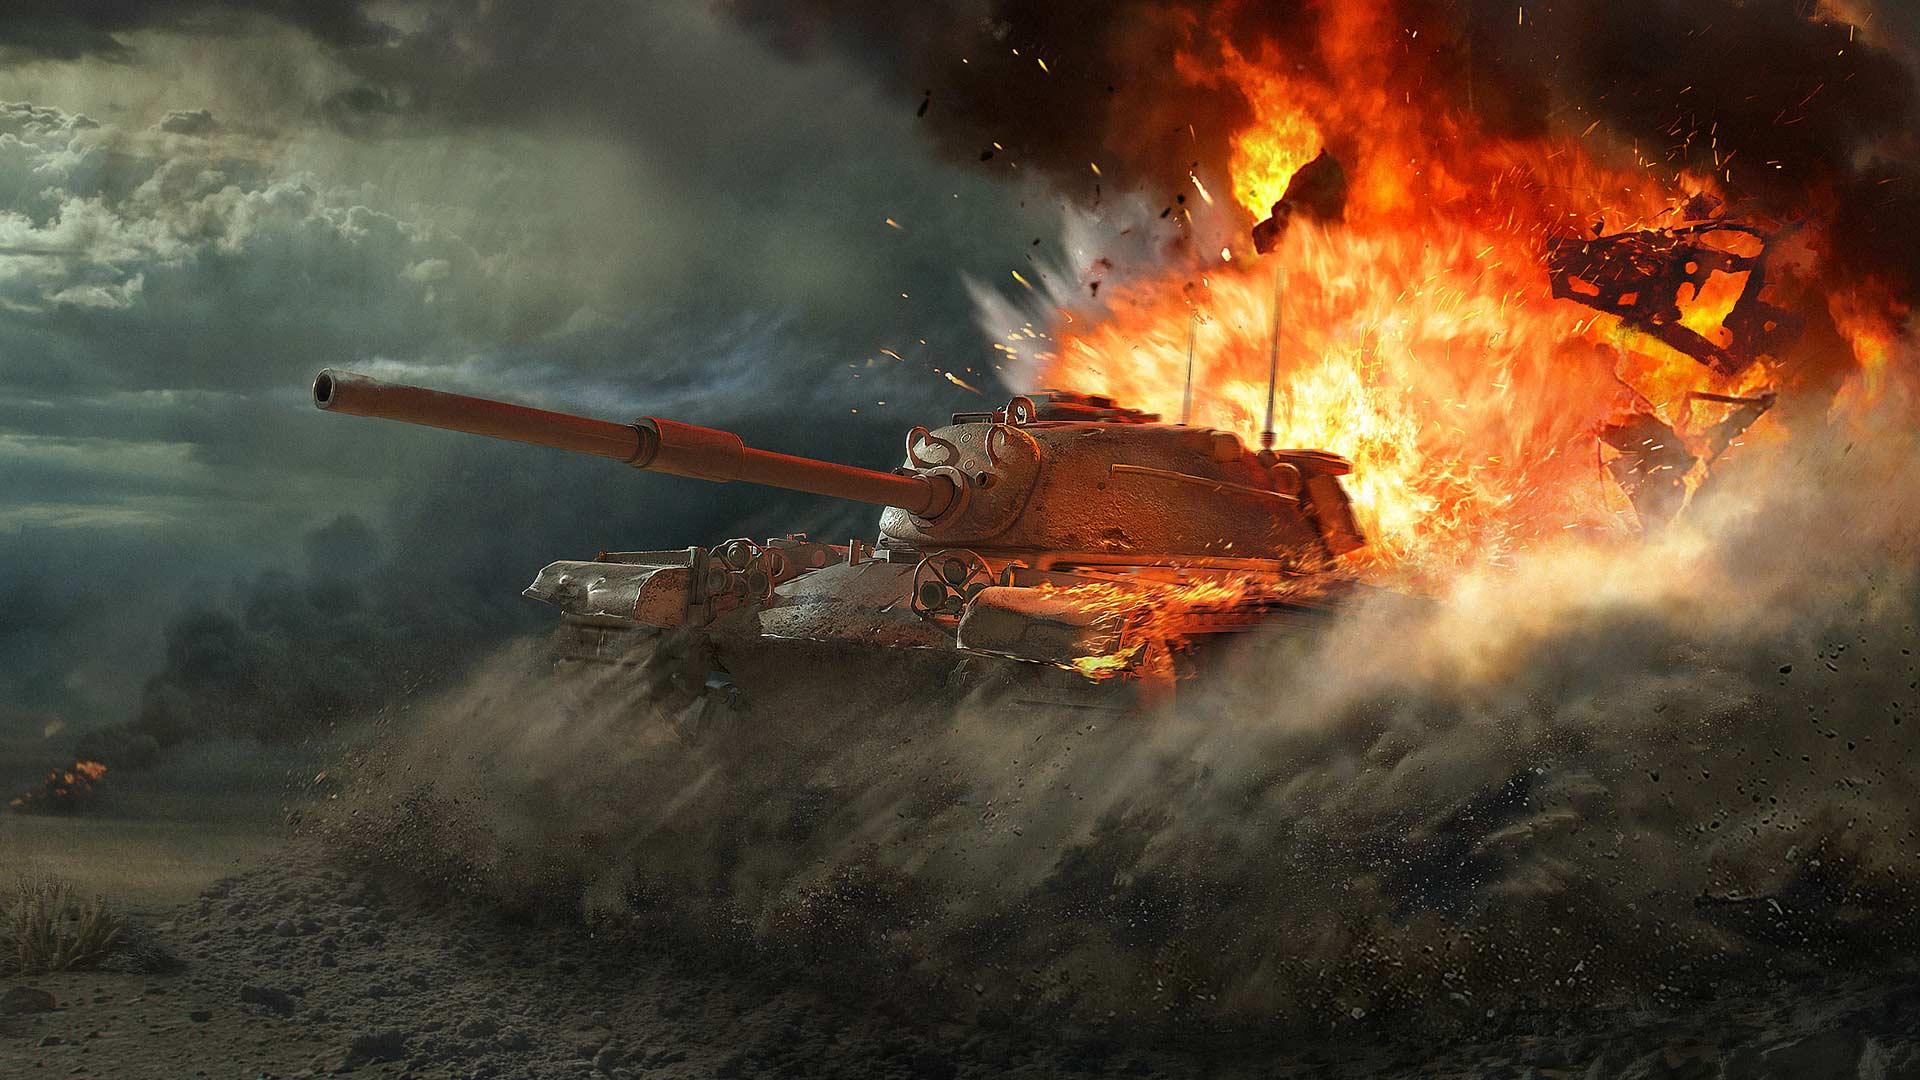 World of tanks: ну что, какой танк круче?